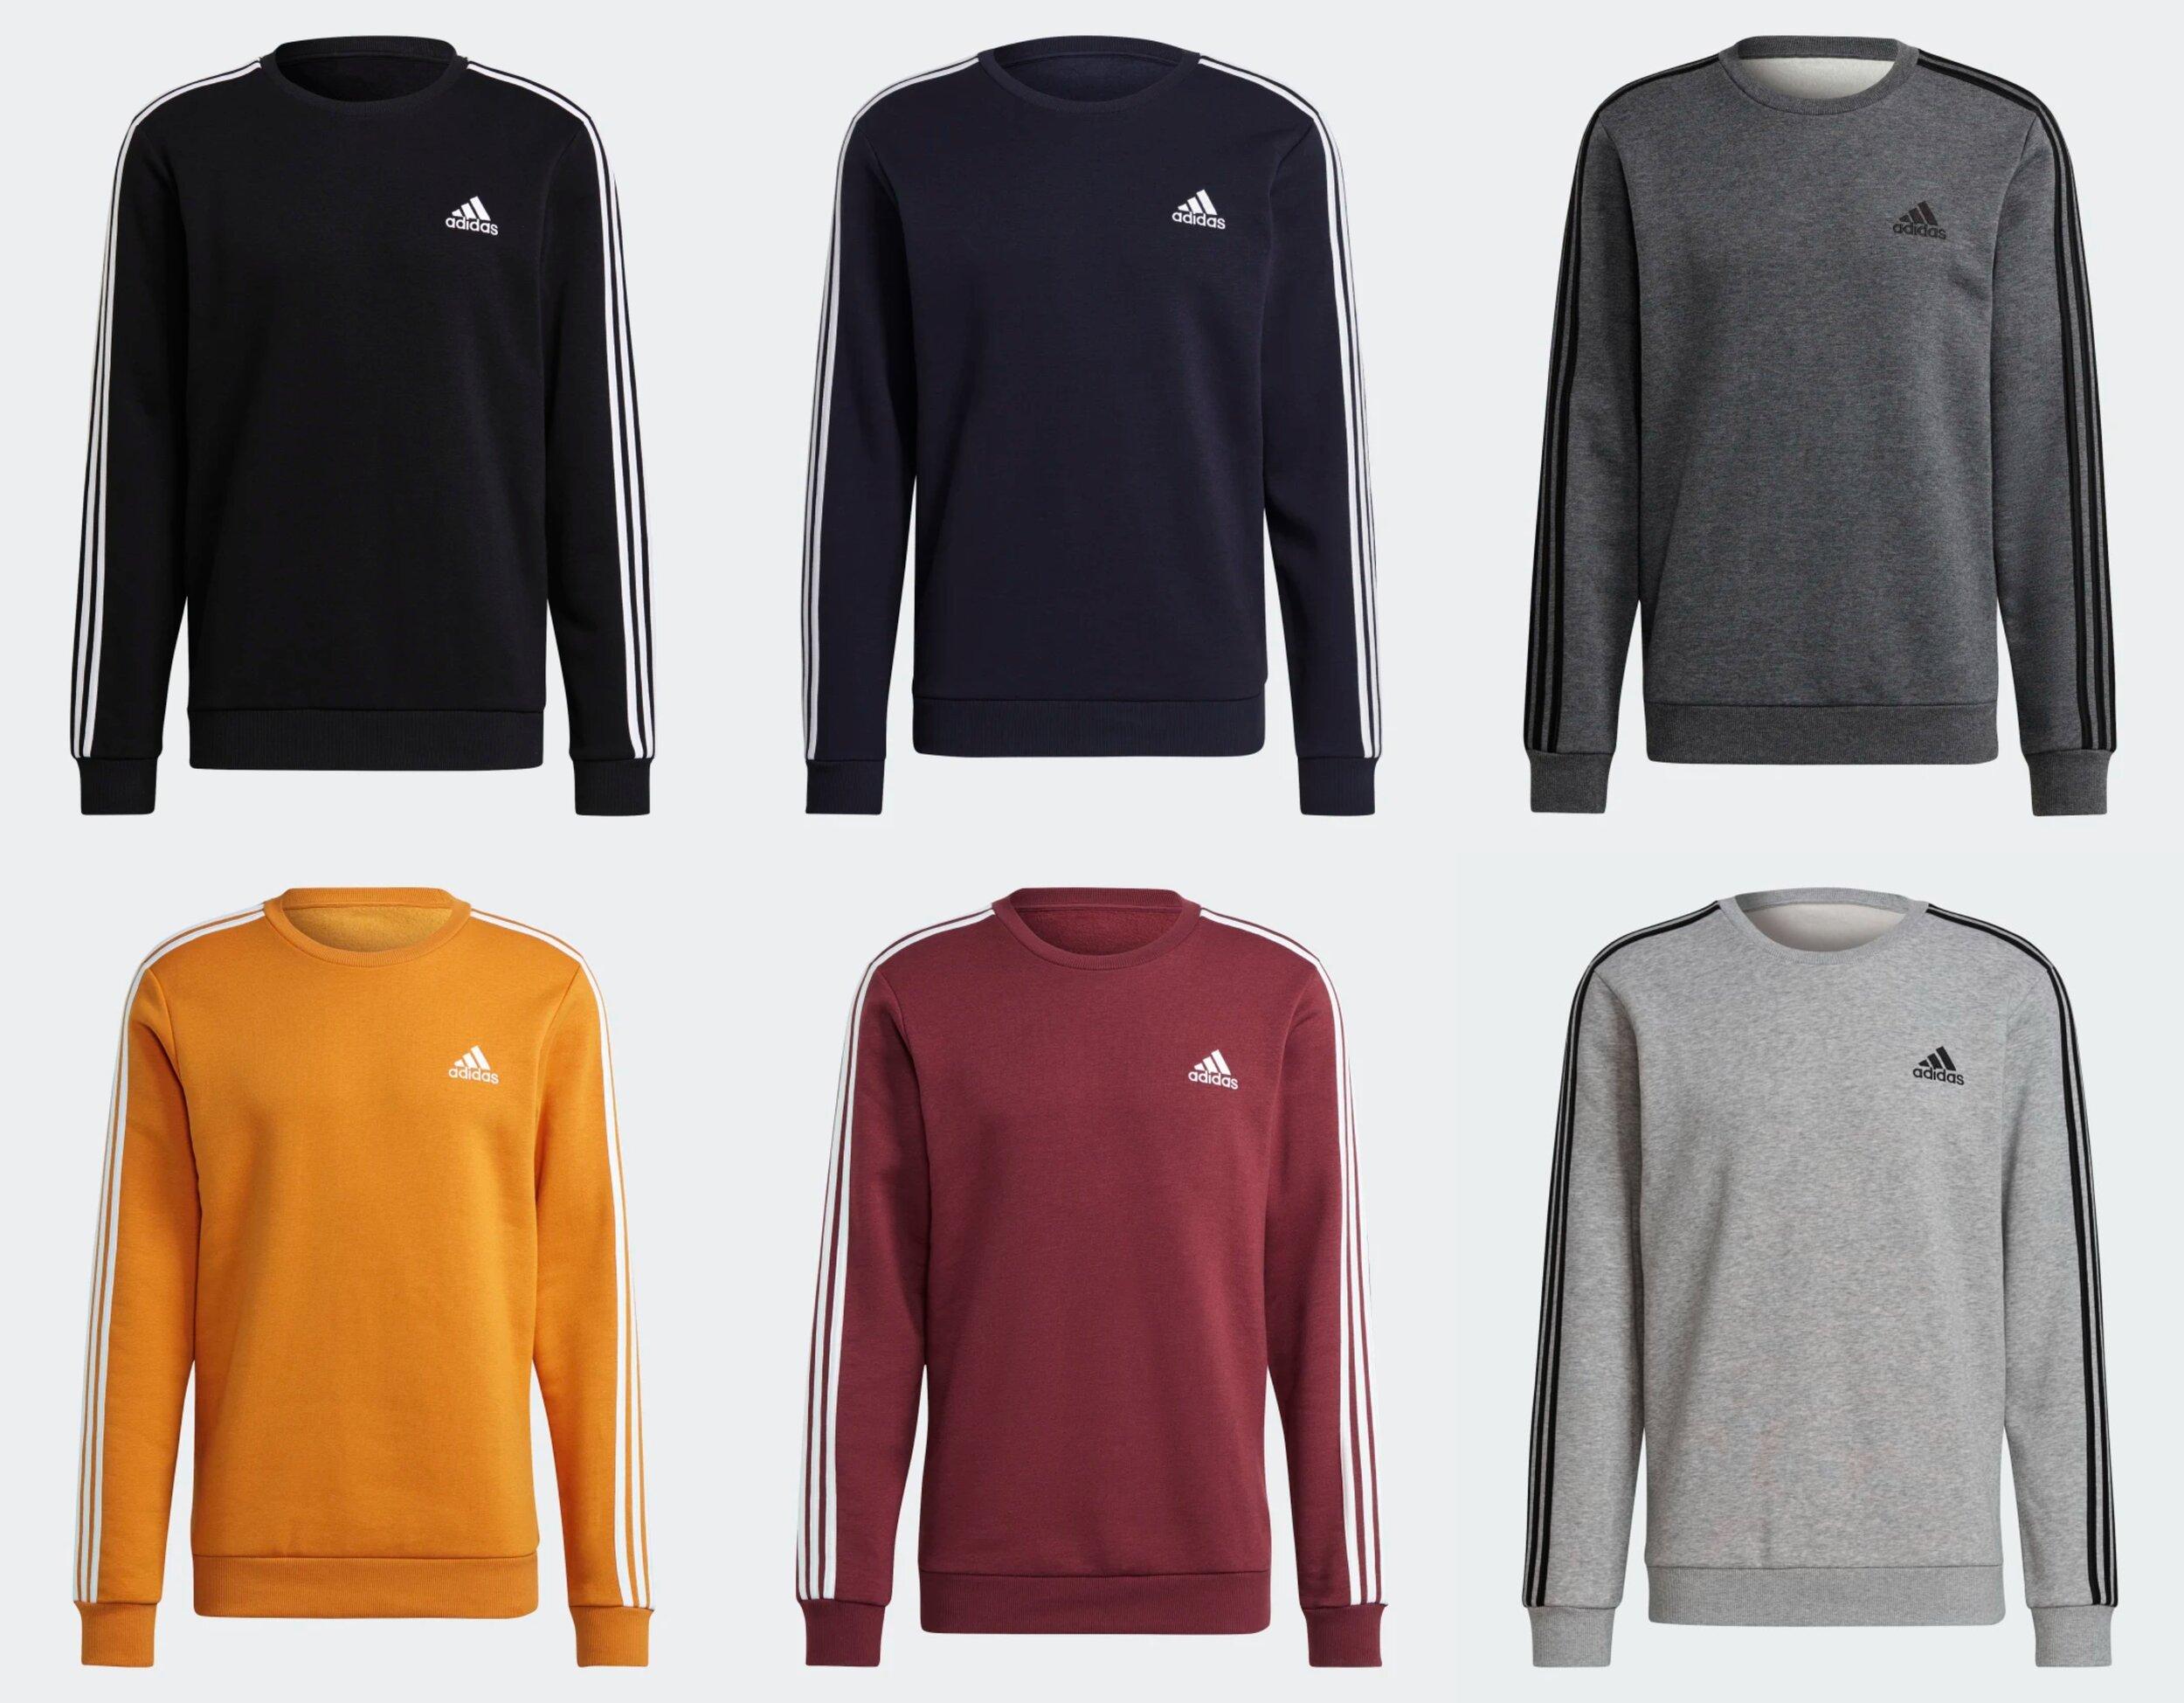 adidas-three-stripe-crewneck-sweatshirts.jpg